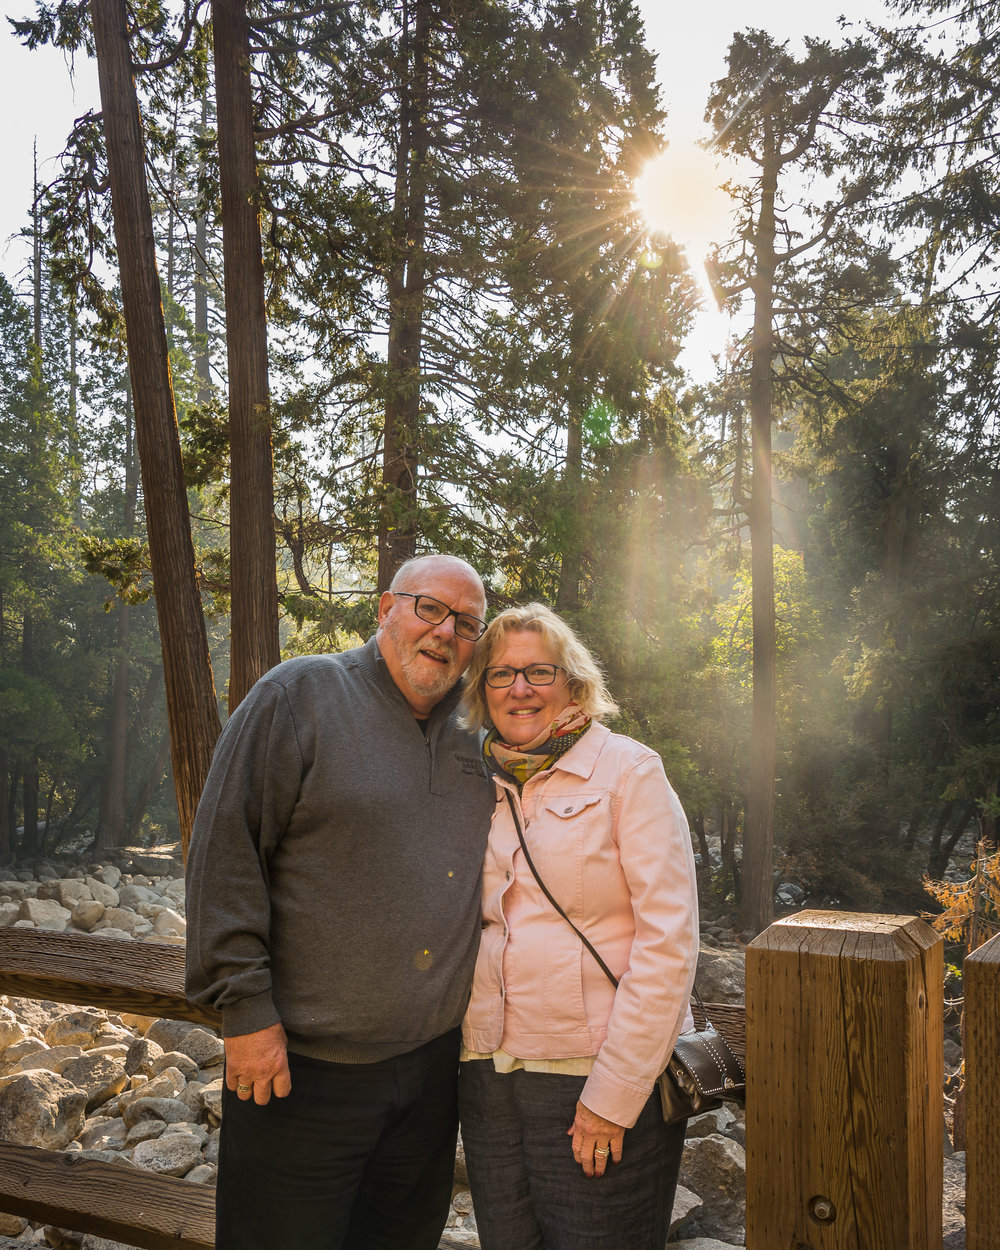 NAPA-Yosemite-57.jpg